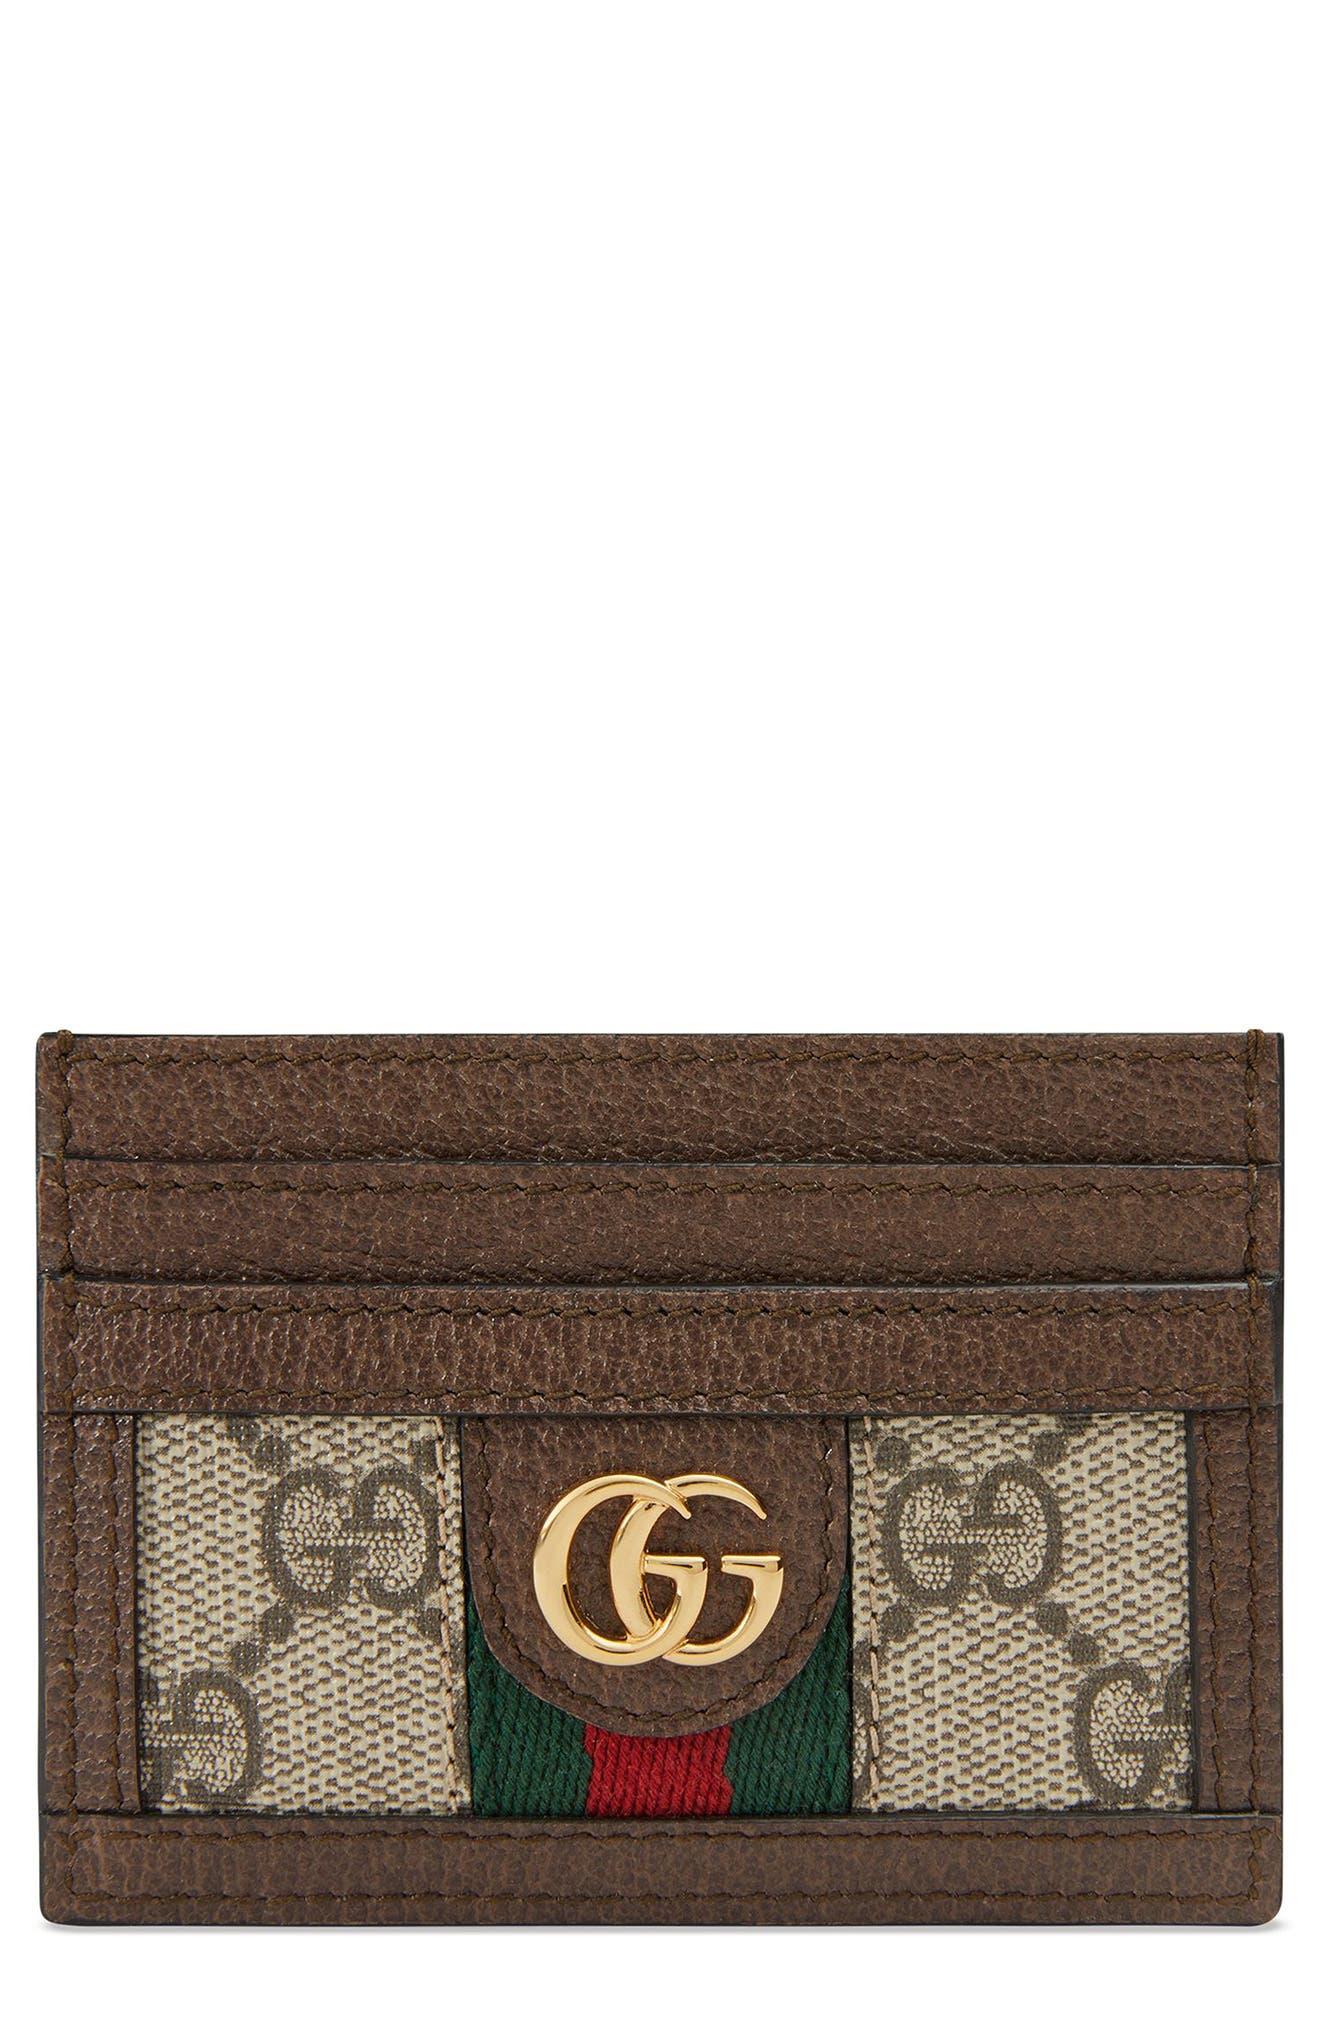 Ophidia GG Supreme Card Case,                         Main,                         color, Beige Ebony/ Acero/ Vert Red